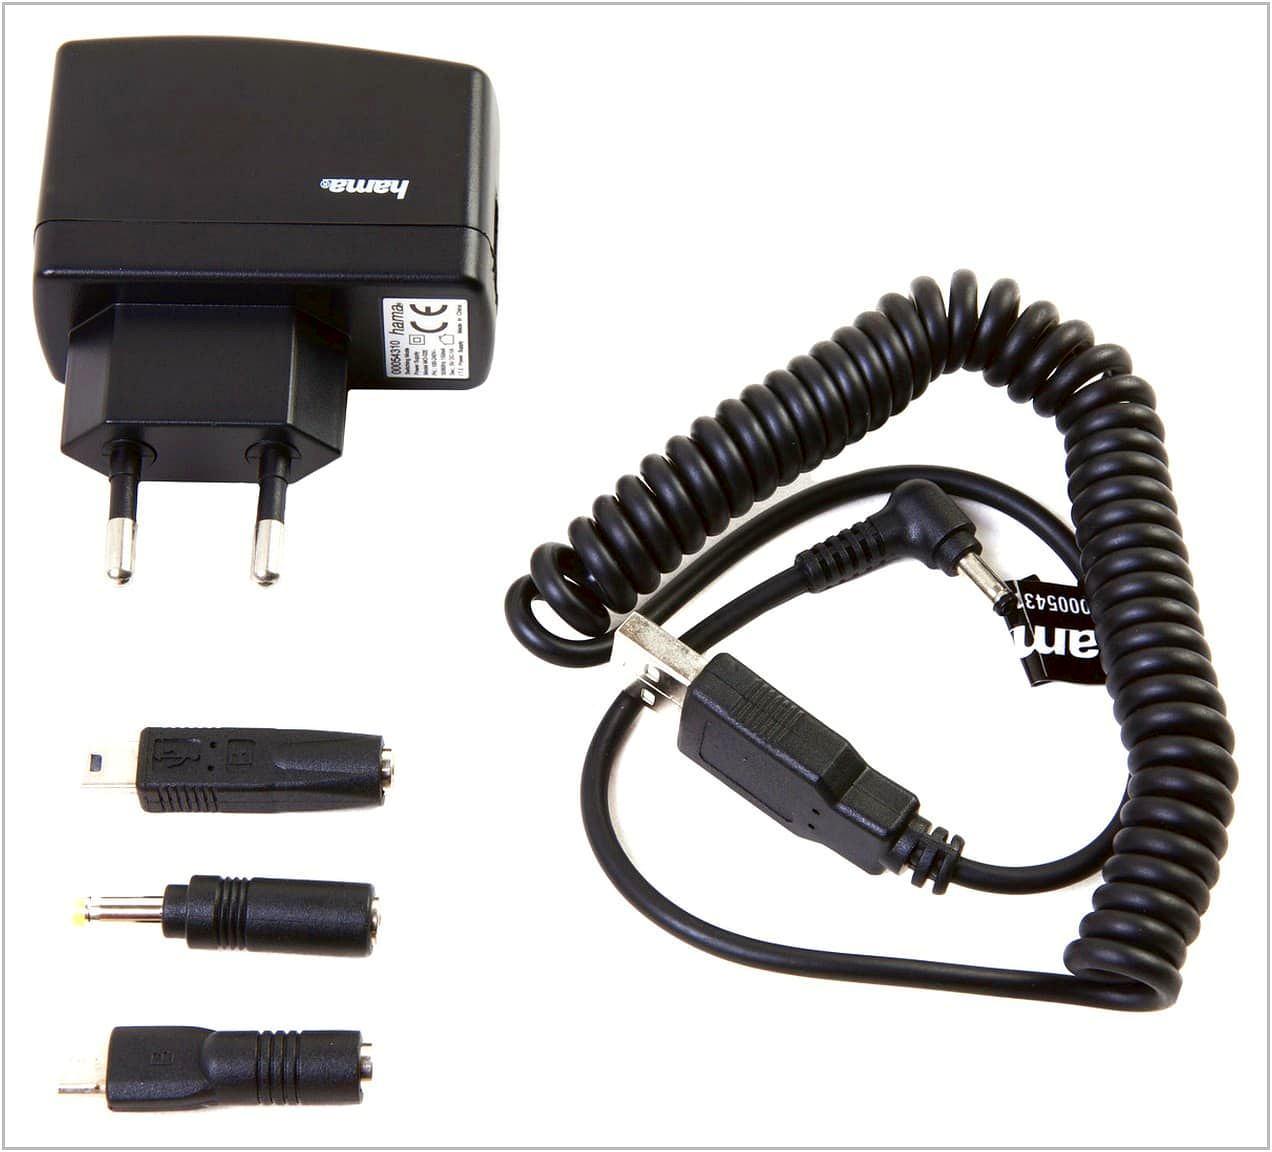 Зарядное устройство для Sony PRS-650 Reader Touch Edition HAMA H-54310